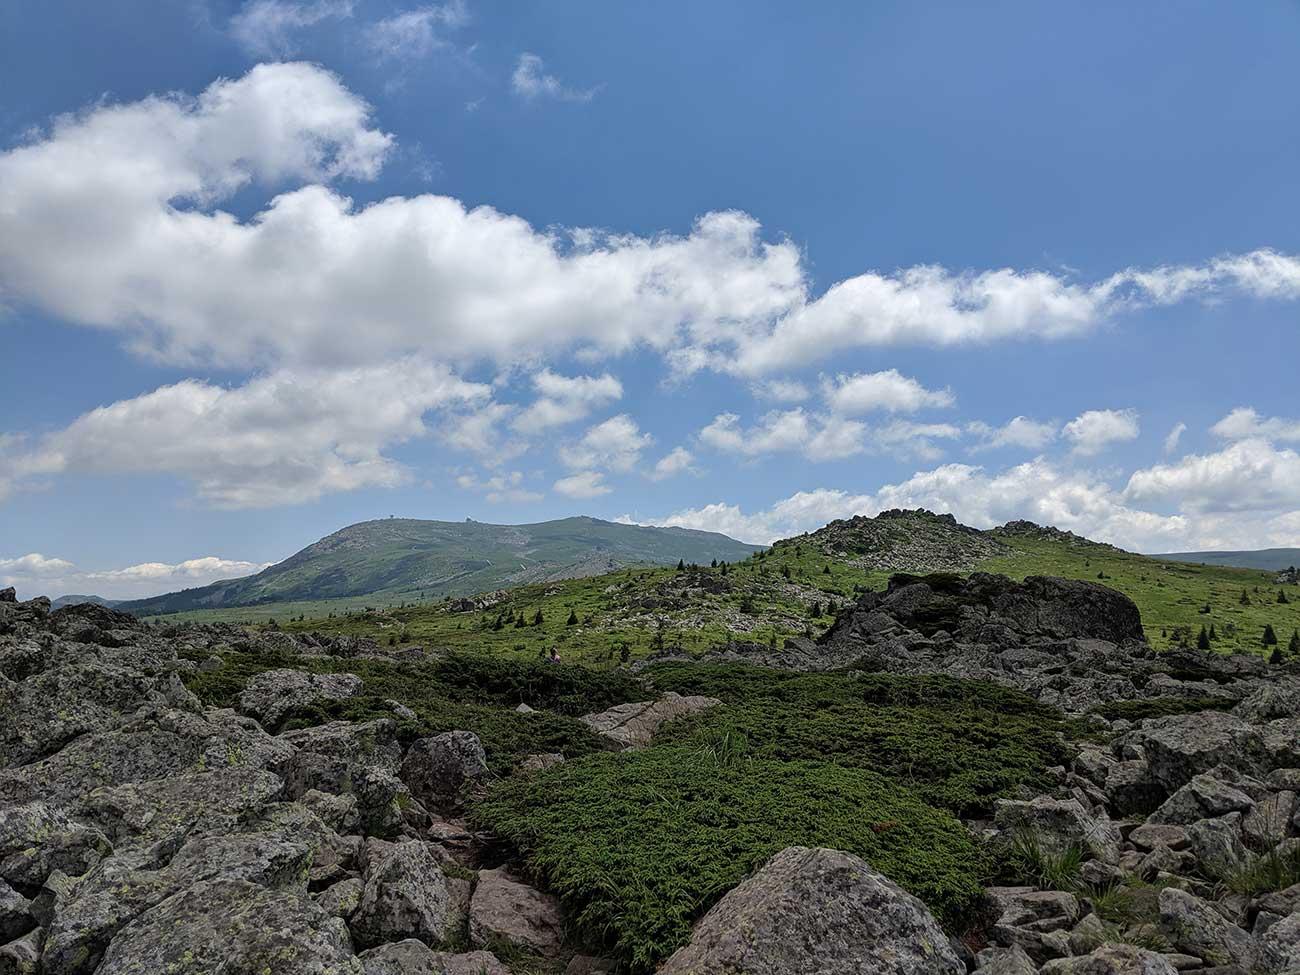 View of Vitosha Mountain summit